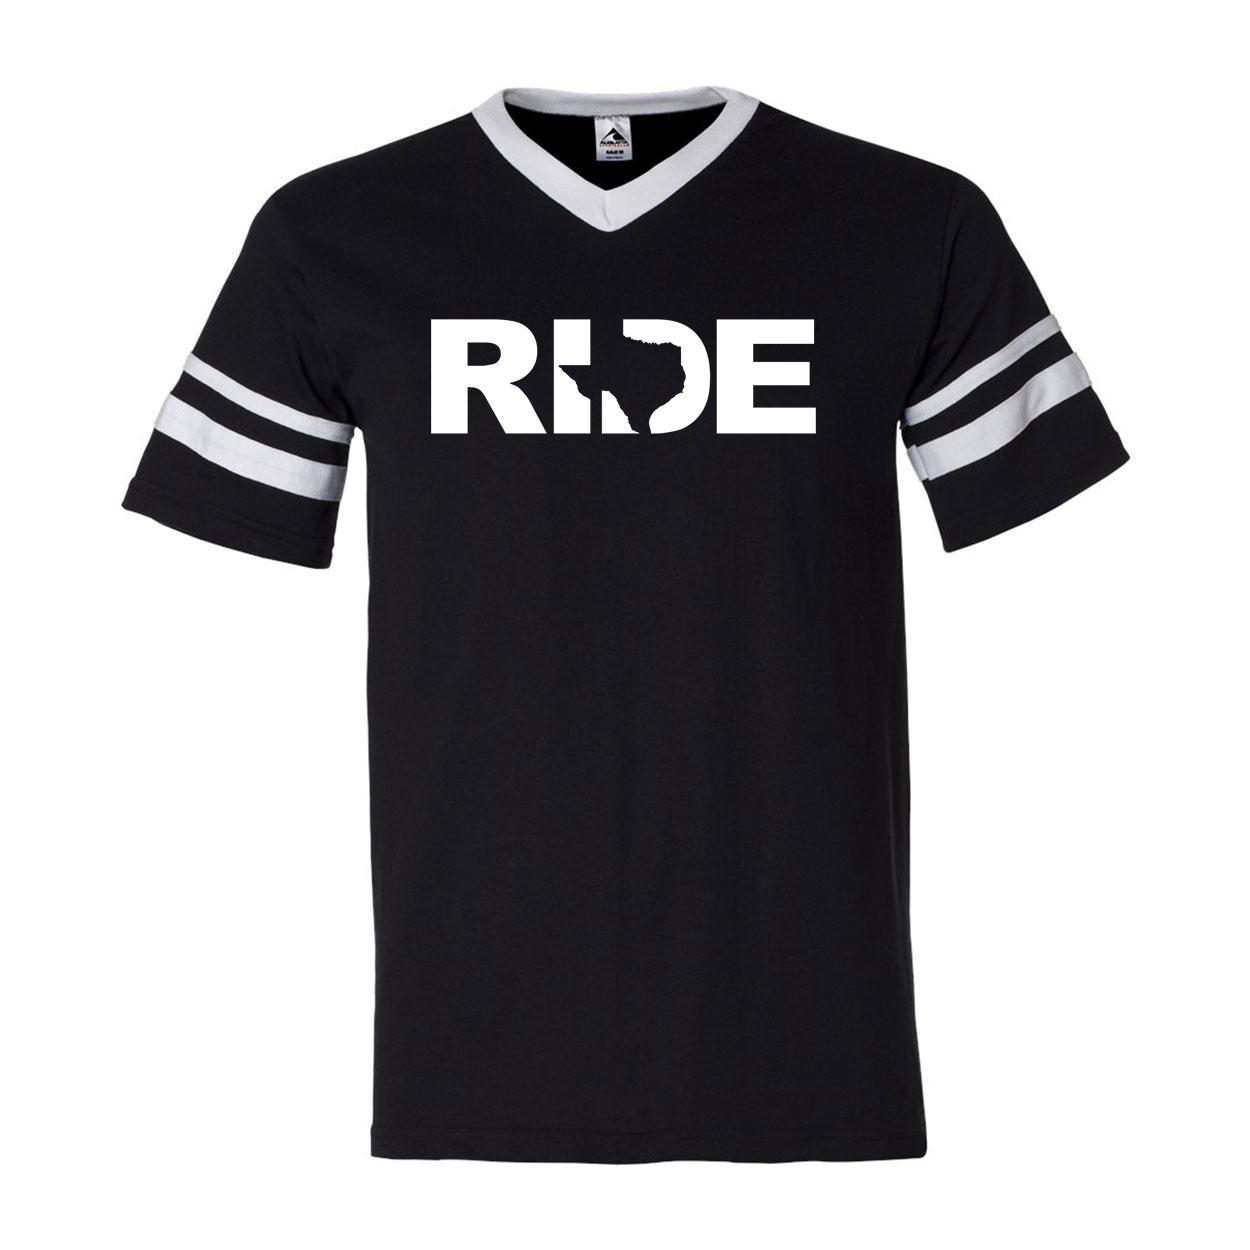 Ride Texas Classic Premium Striped Jersey T-Shirt Black/White (White Logo)